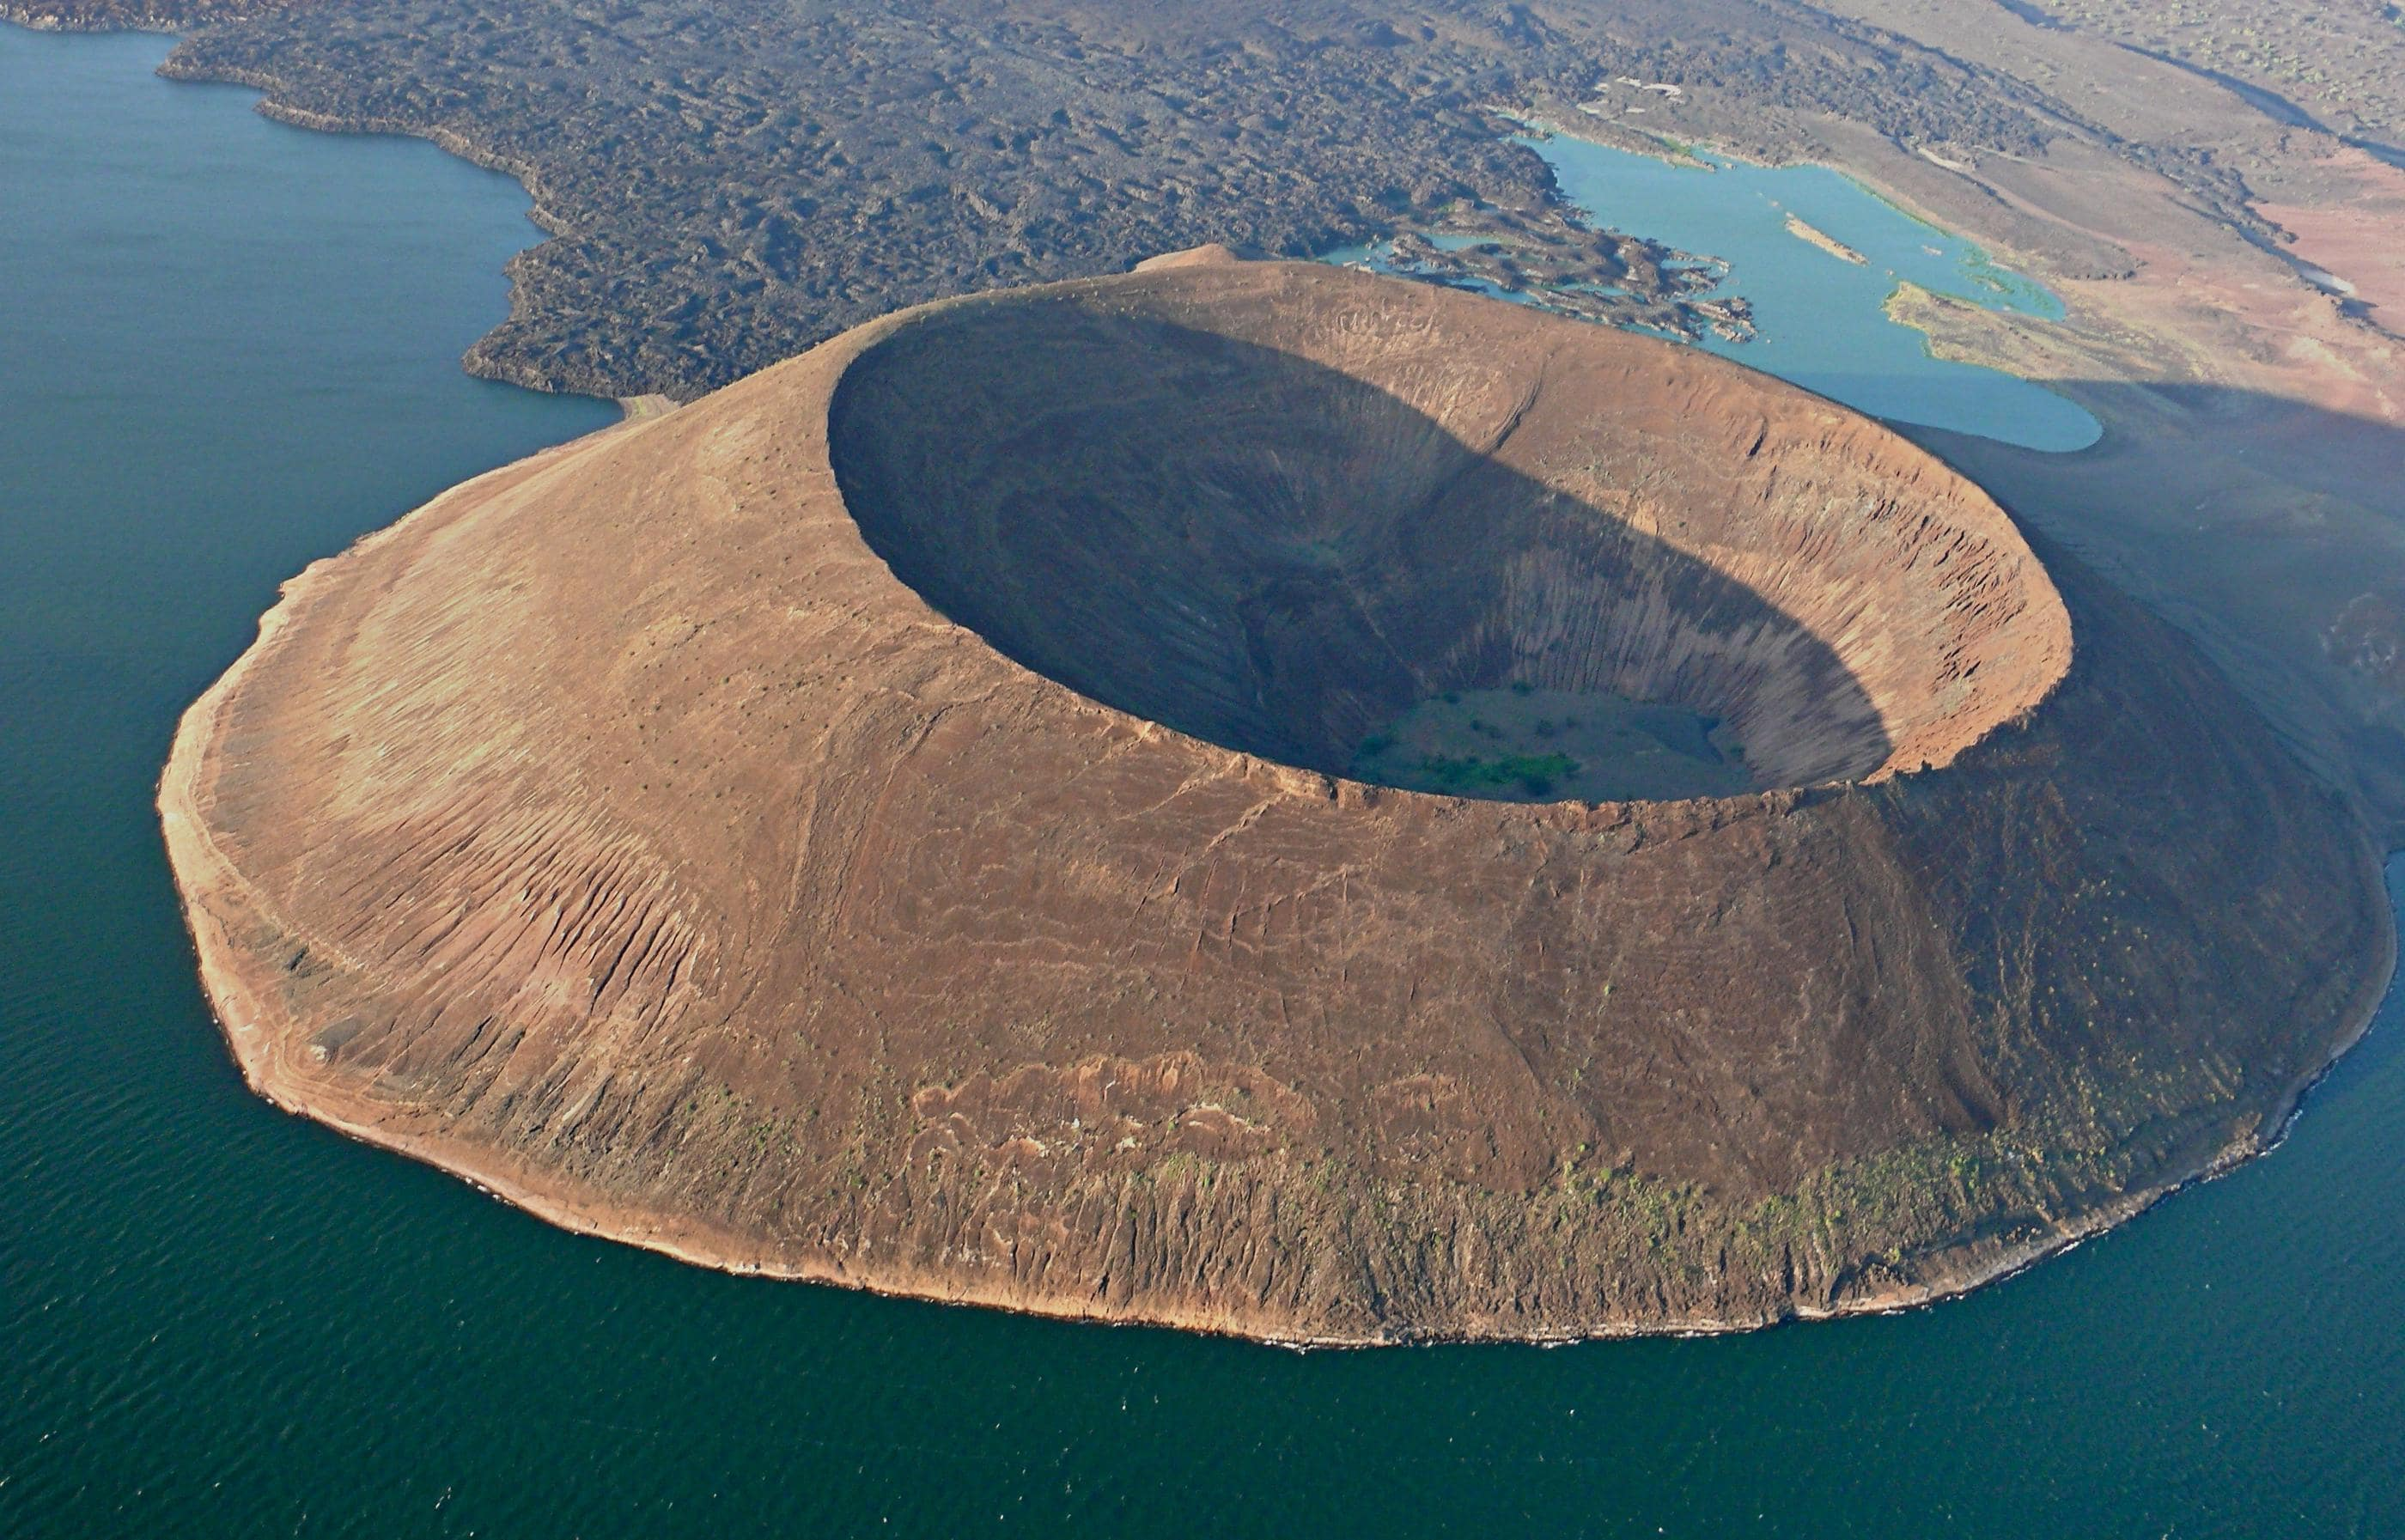 nabiyotum-crater-and-the-lake-turkana-k-secret-world